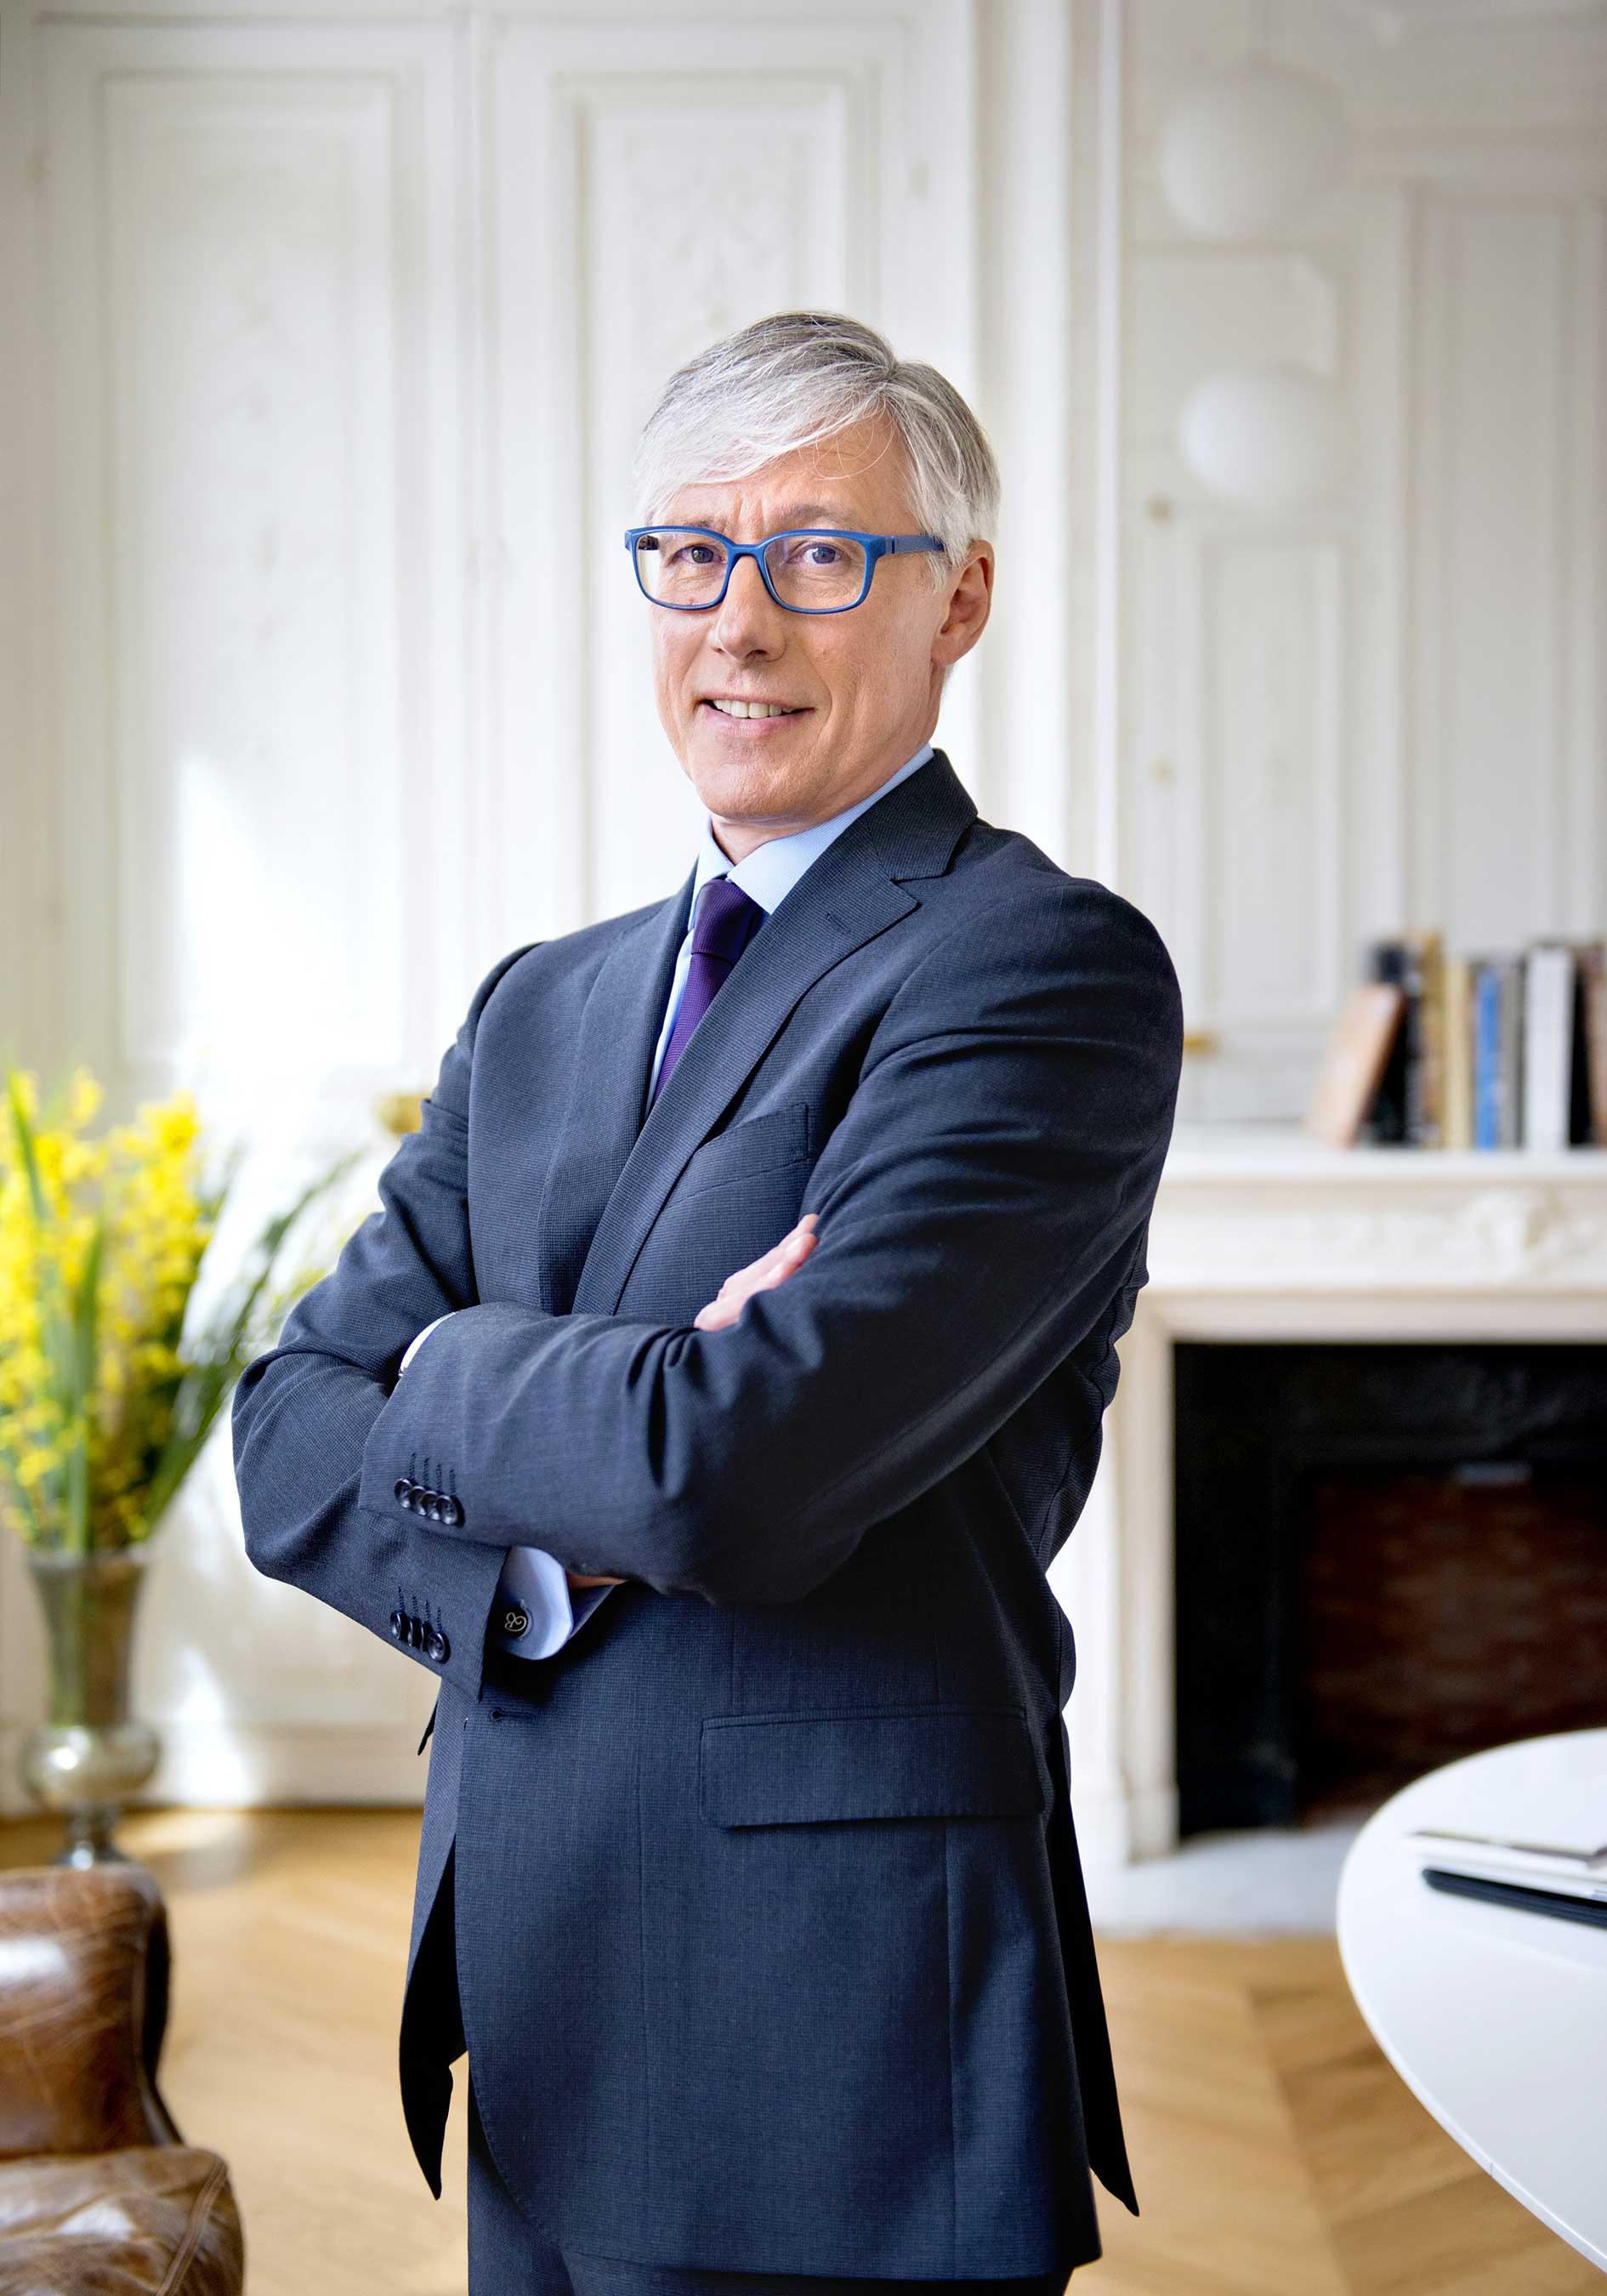 Olivier Brandicourt, Chief Executive Officer